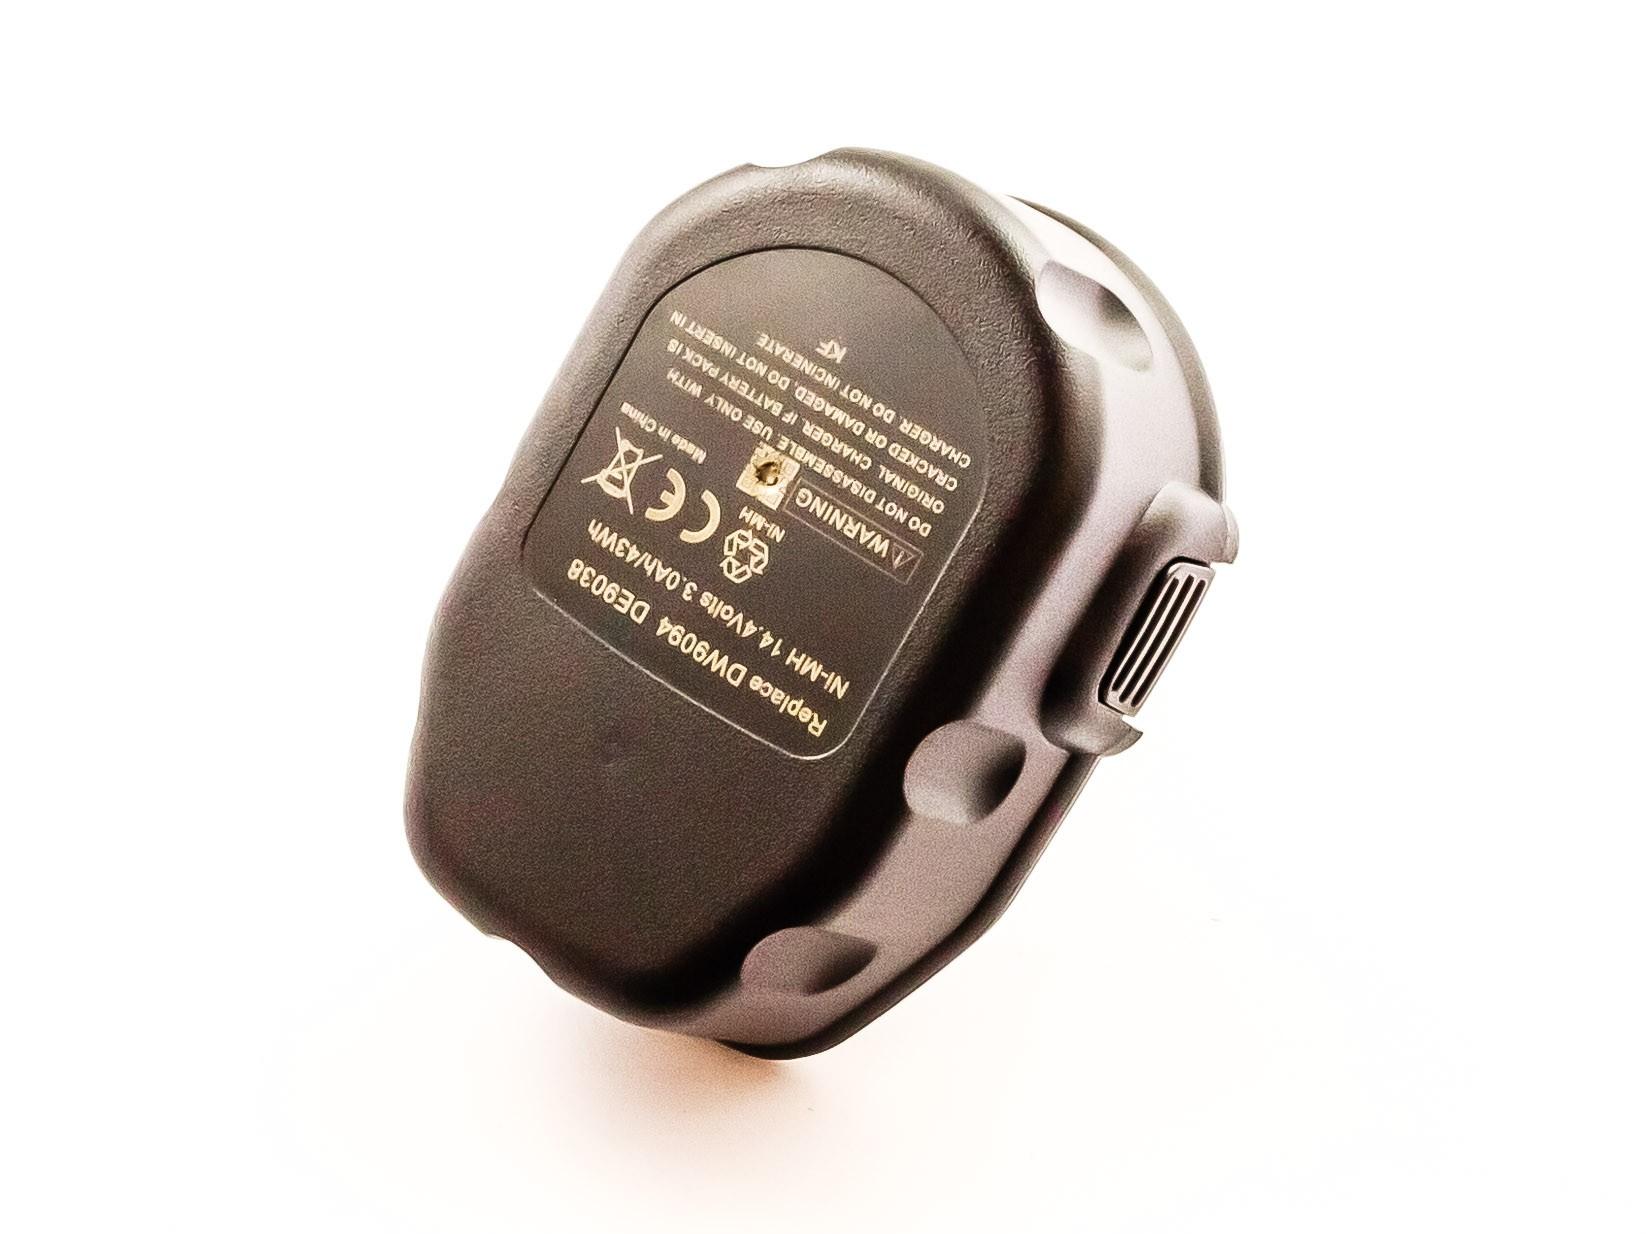 Bateria Compatível 652345-01, DC9091, DC9094, DE9031, DE9038, DE9091, etc DEWALT (3000mAh)